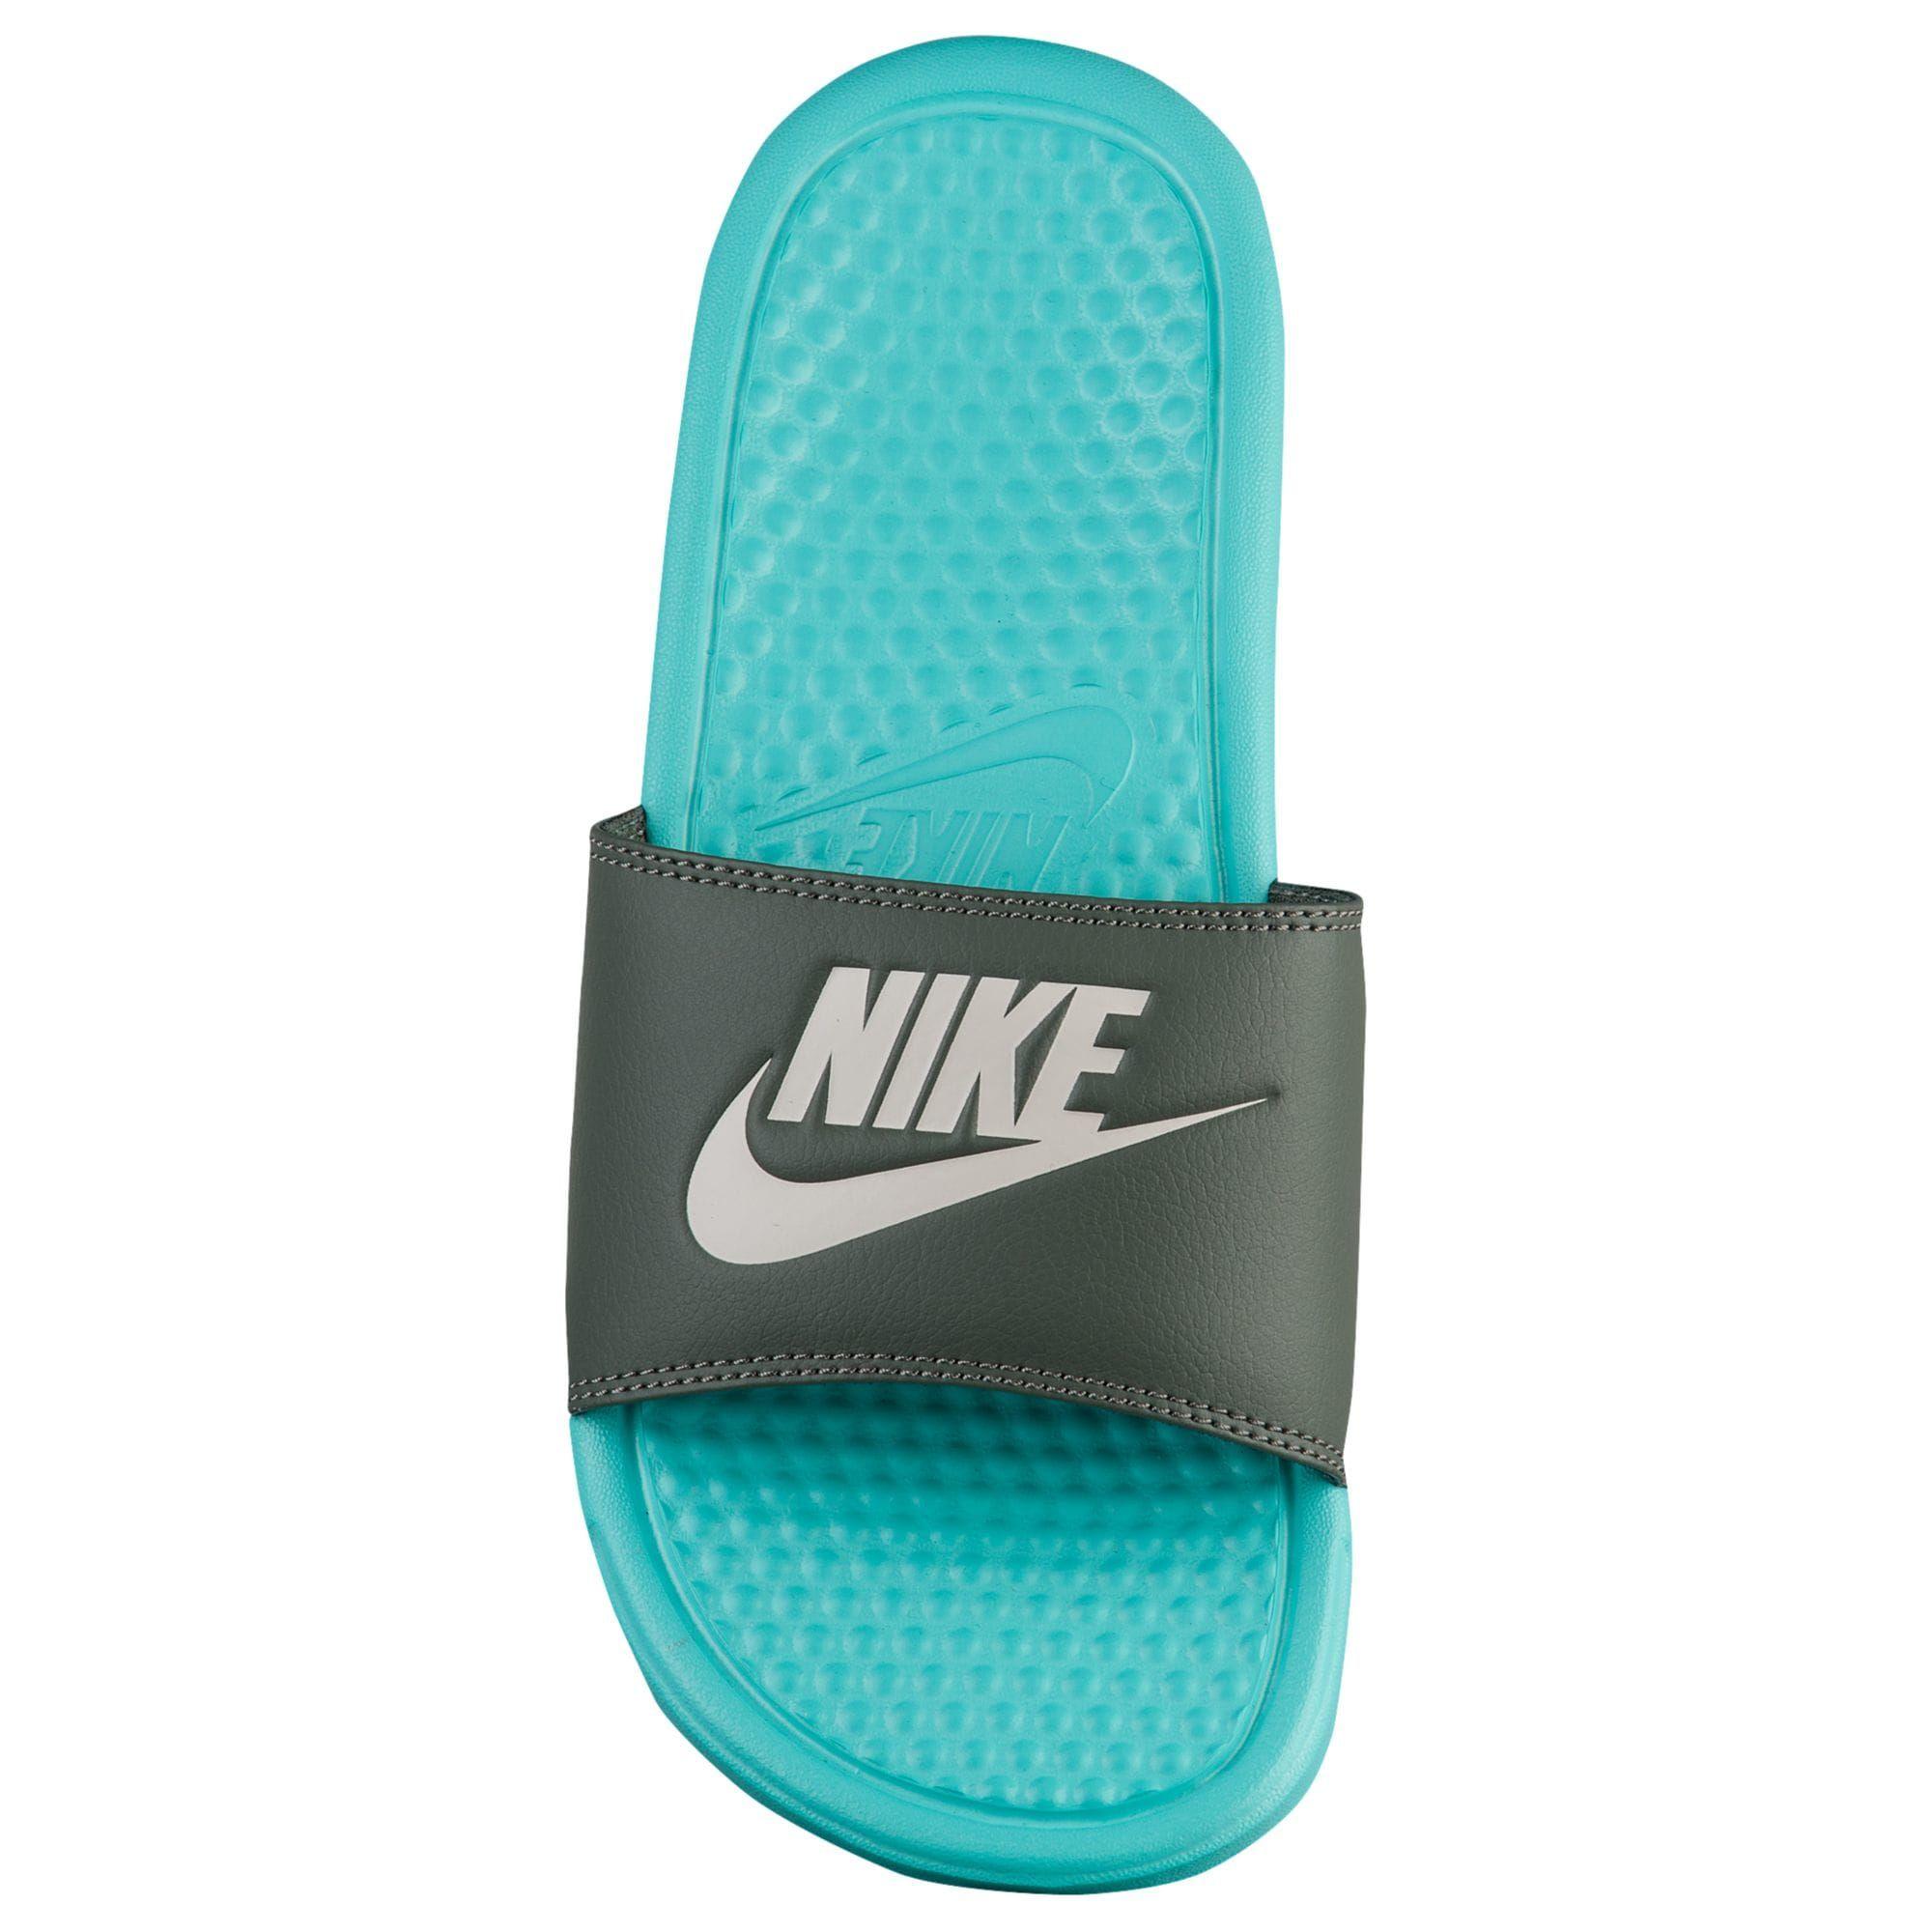 buy online c6e8e 0bb4f Nike Benassi JDI Slide - Women's at Champs Sports | Shoes in ...